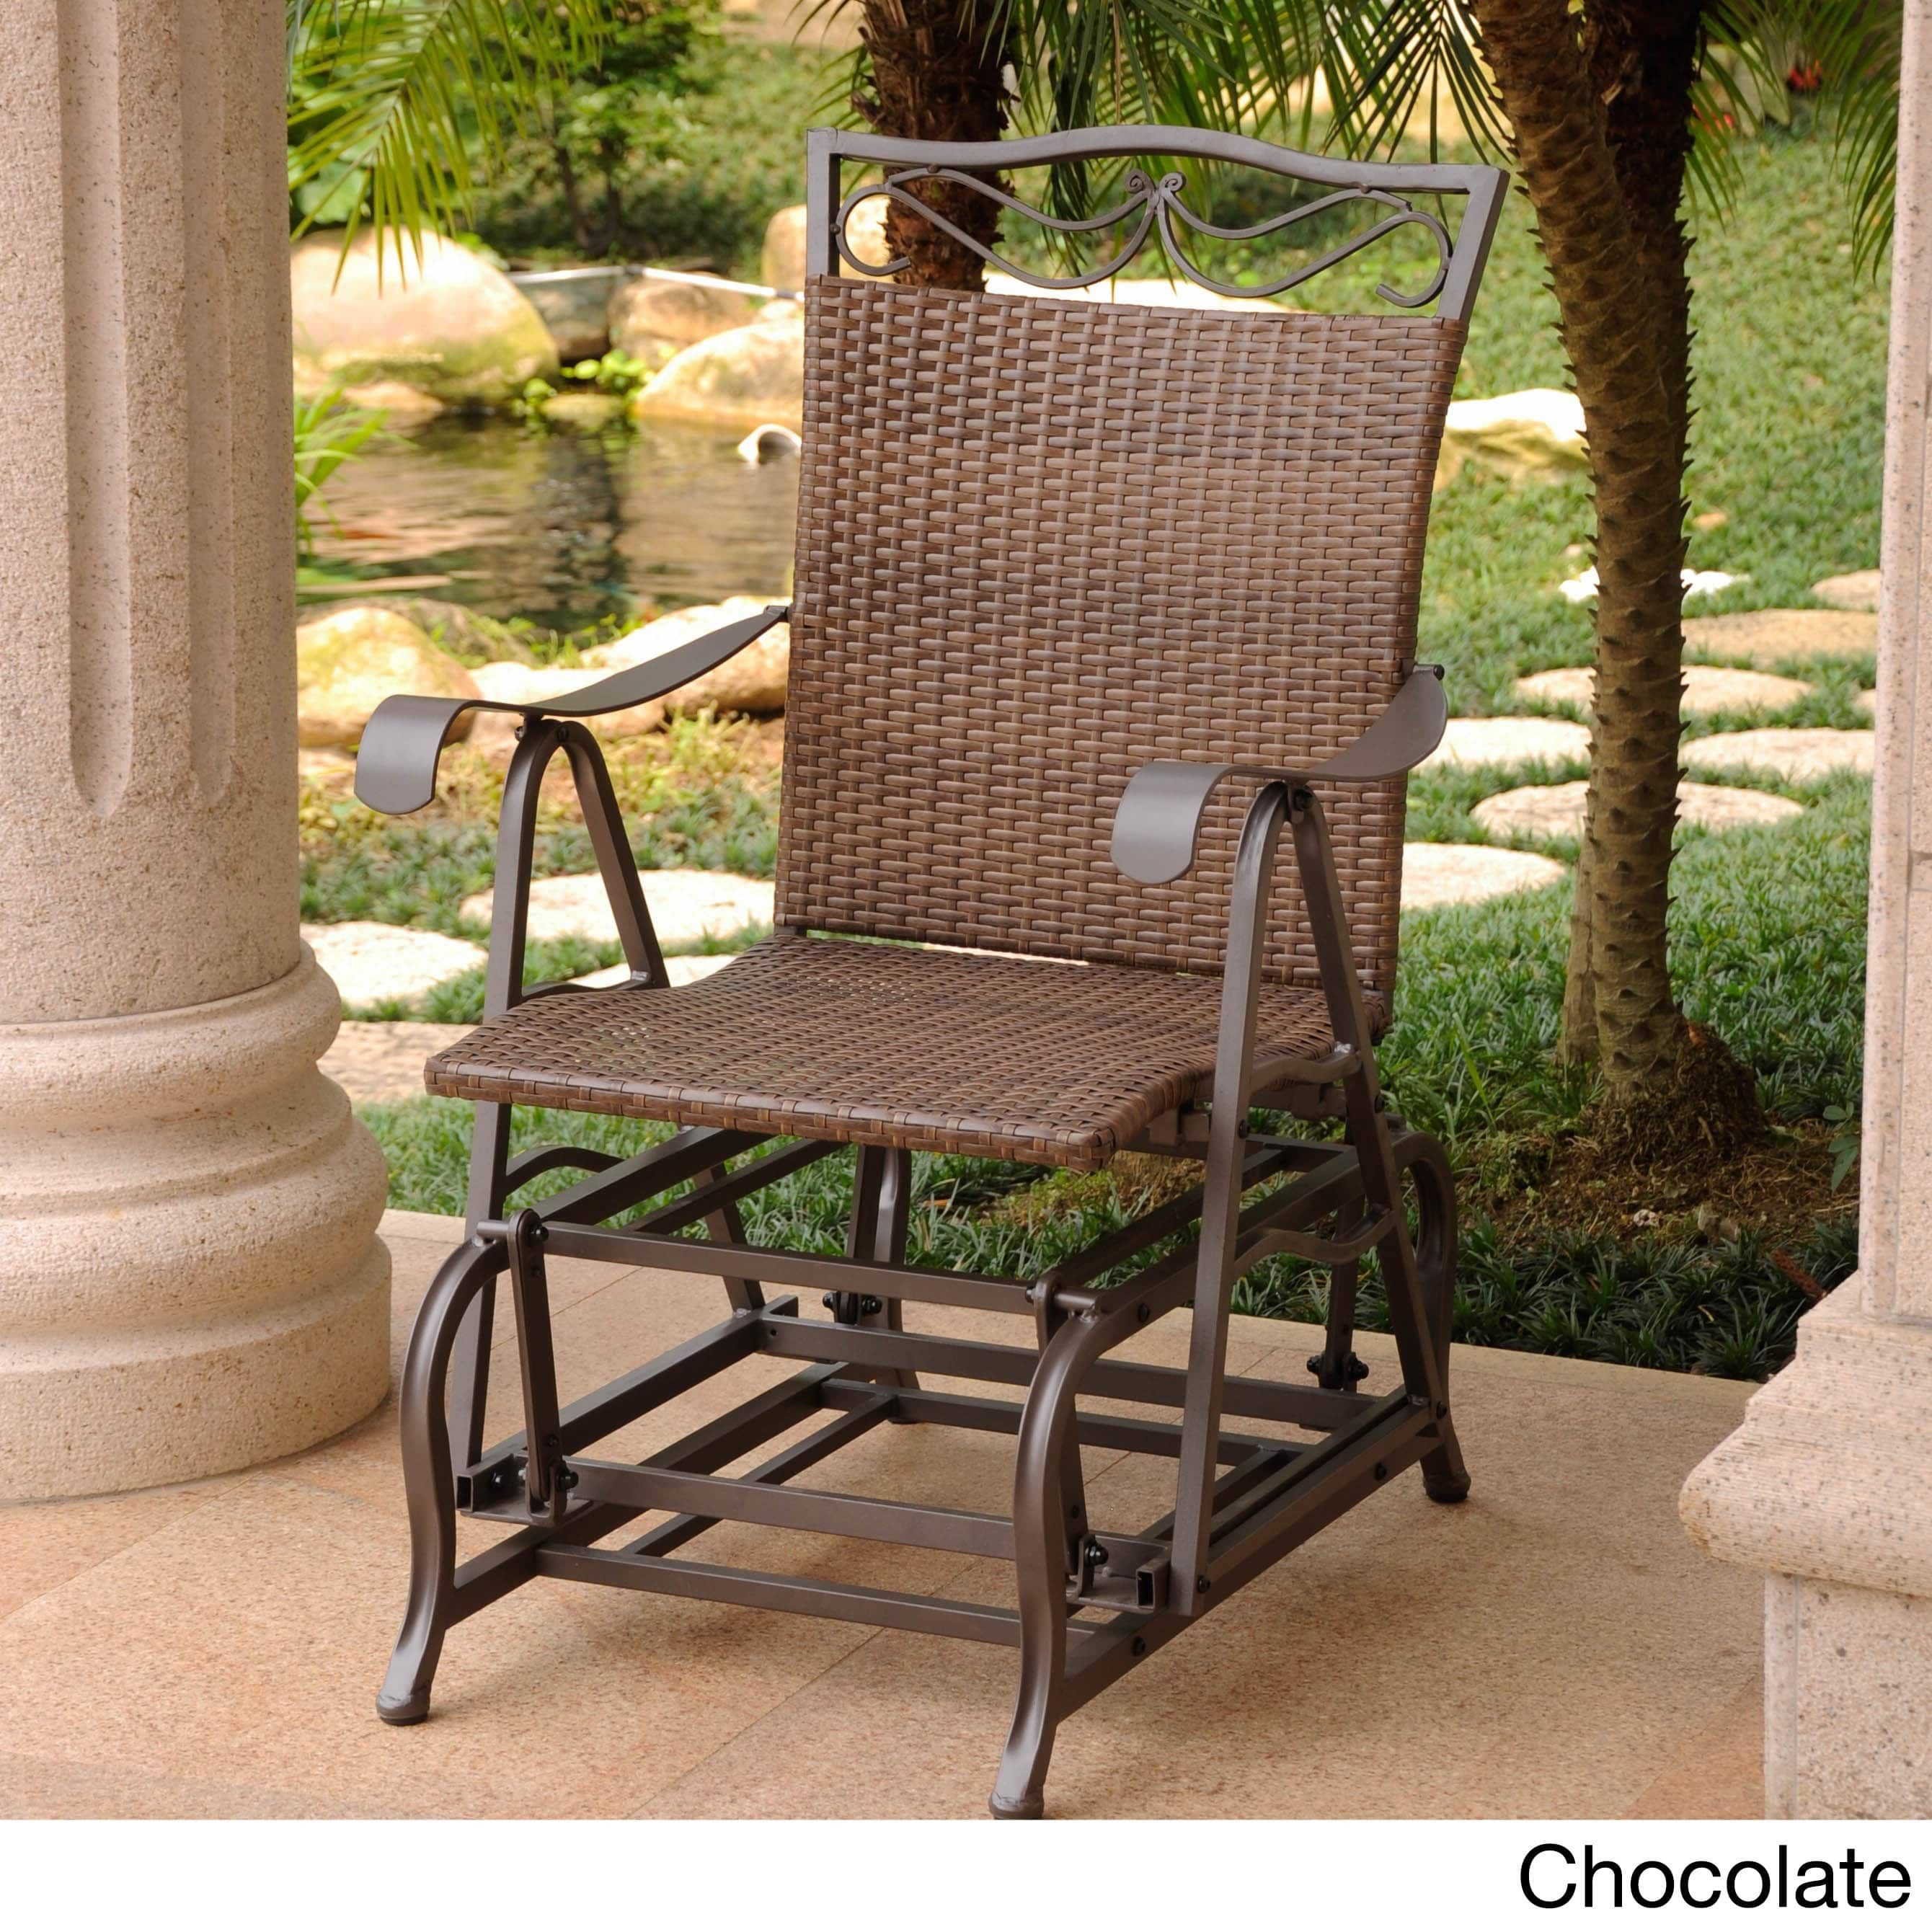 International Caravan Valencia Resin Wicker Steel Frame Single Glider Chair Chocolate Brown Patio Furniture Metal